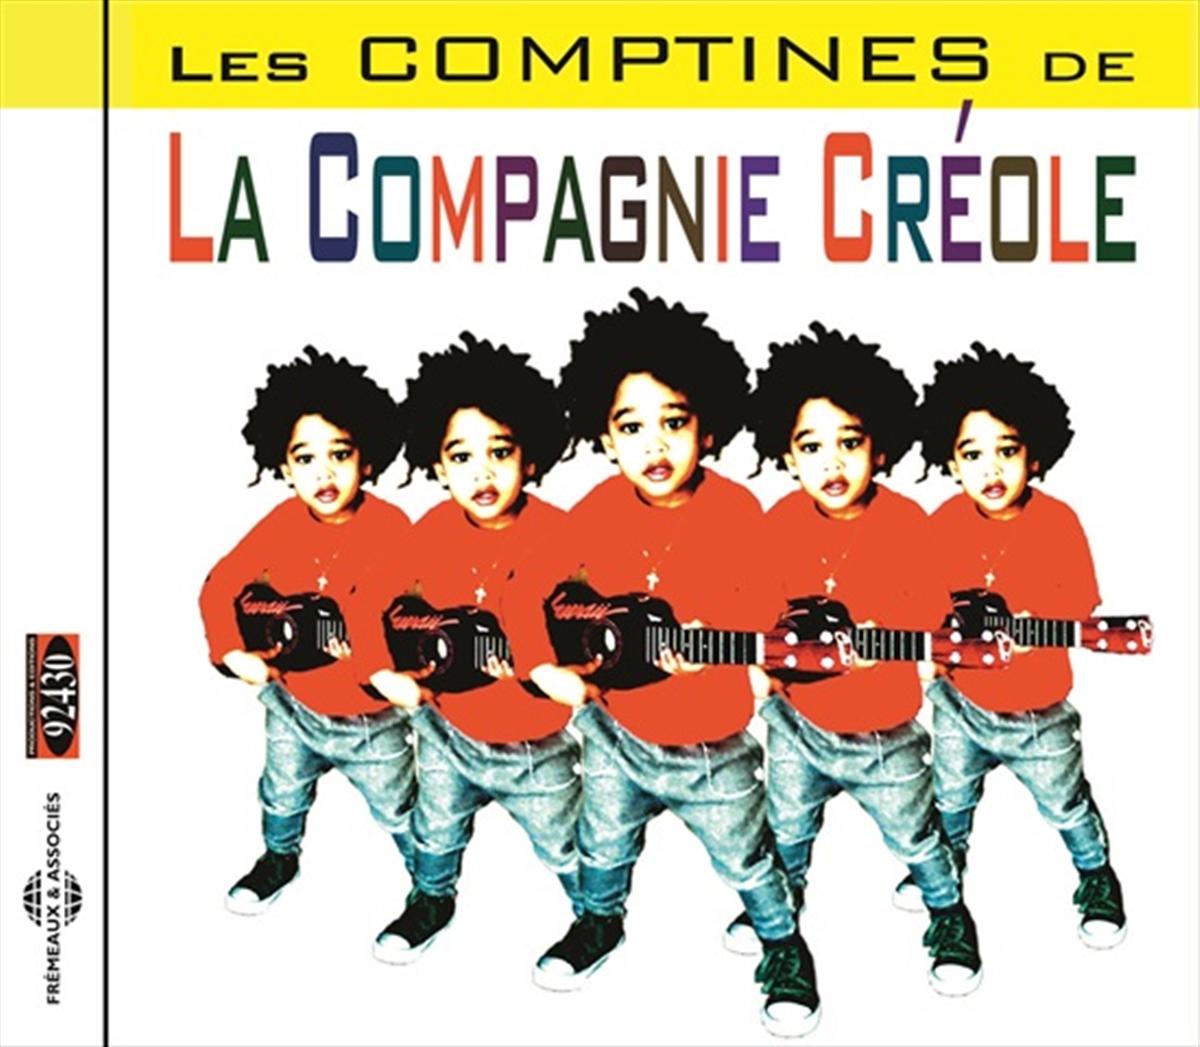 Galileo Music Webshop La Compagnie Creole Les Comptines De